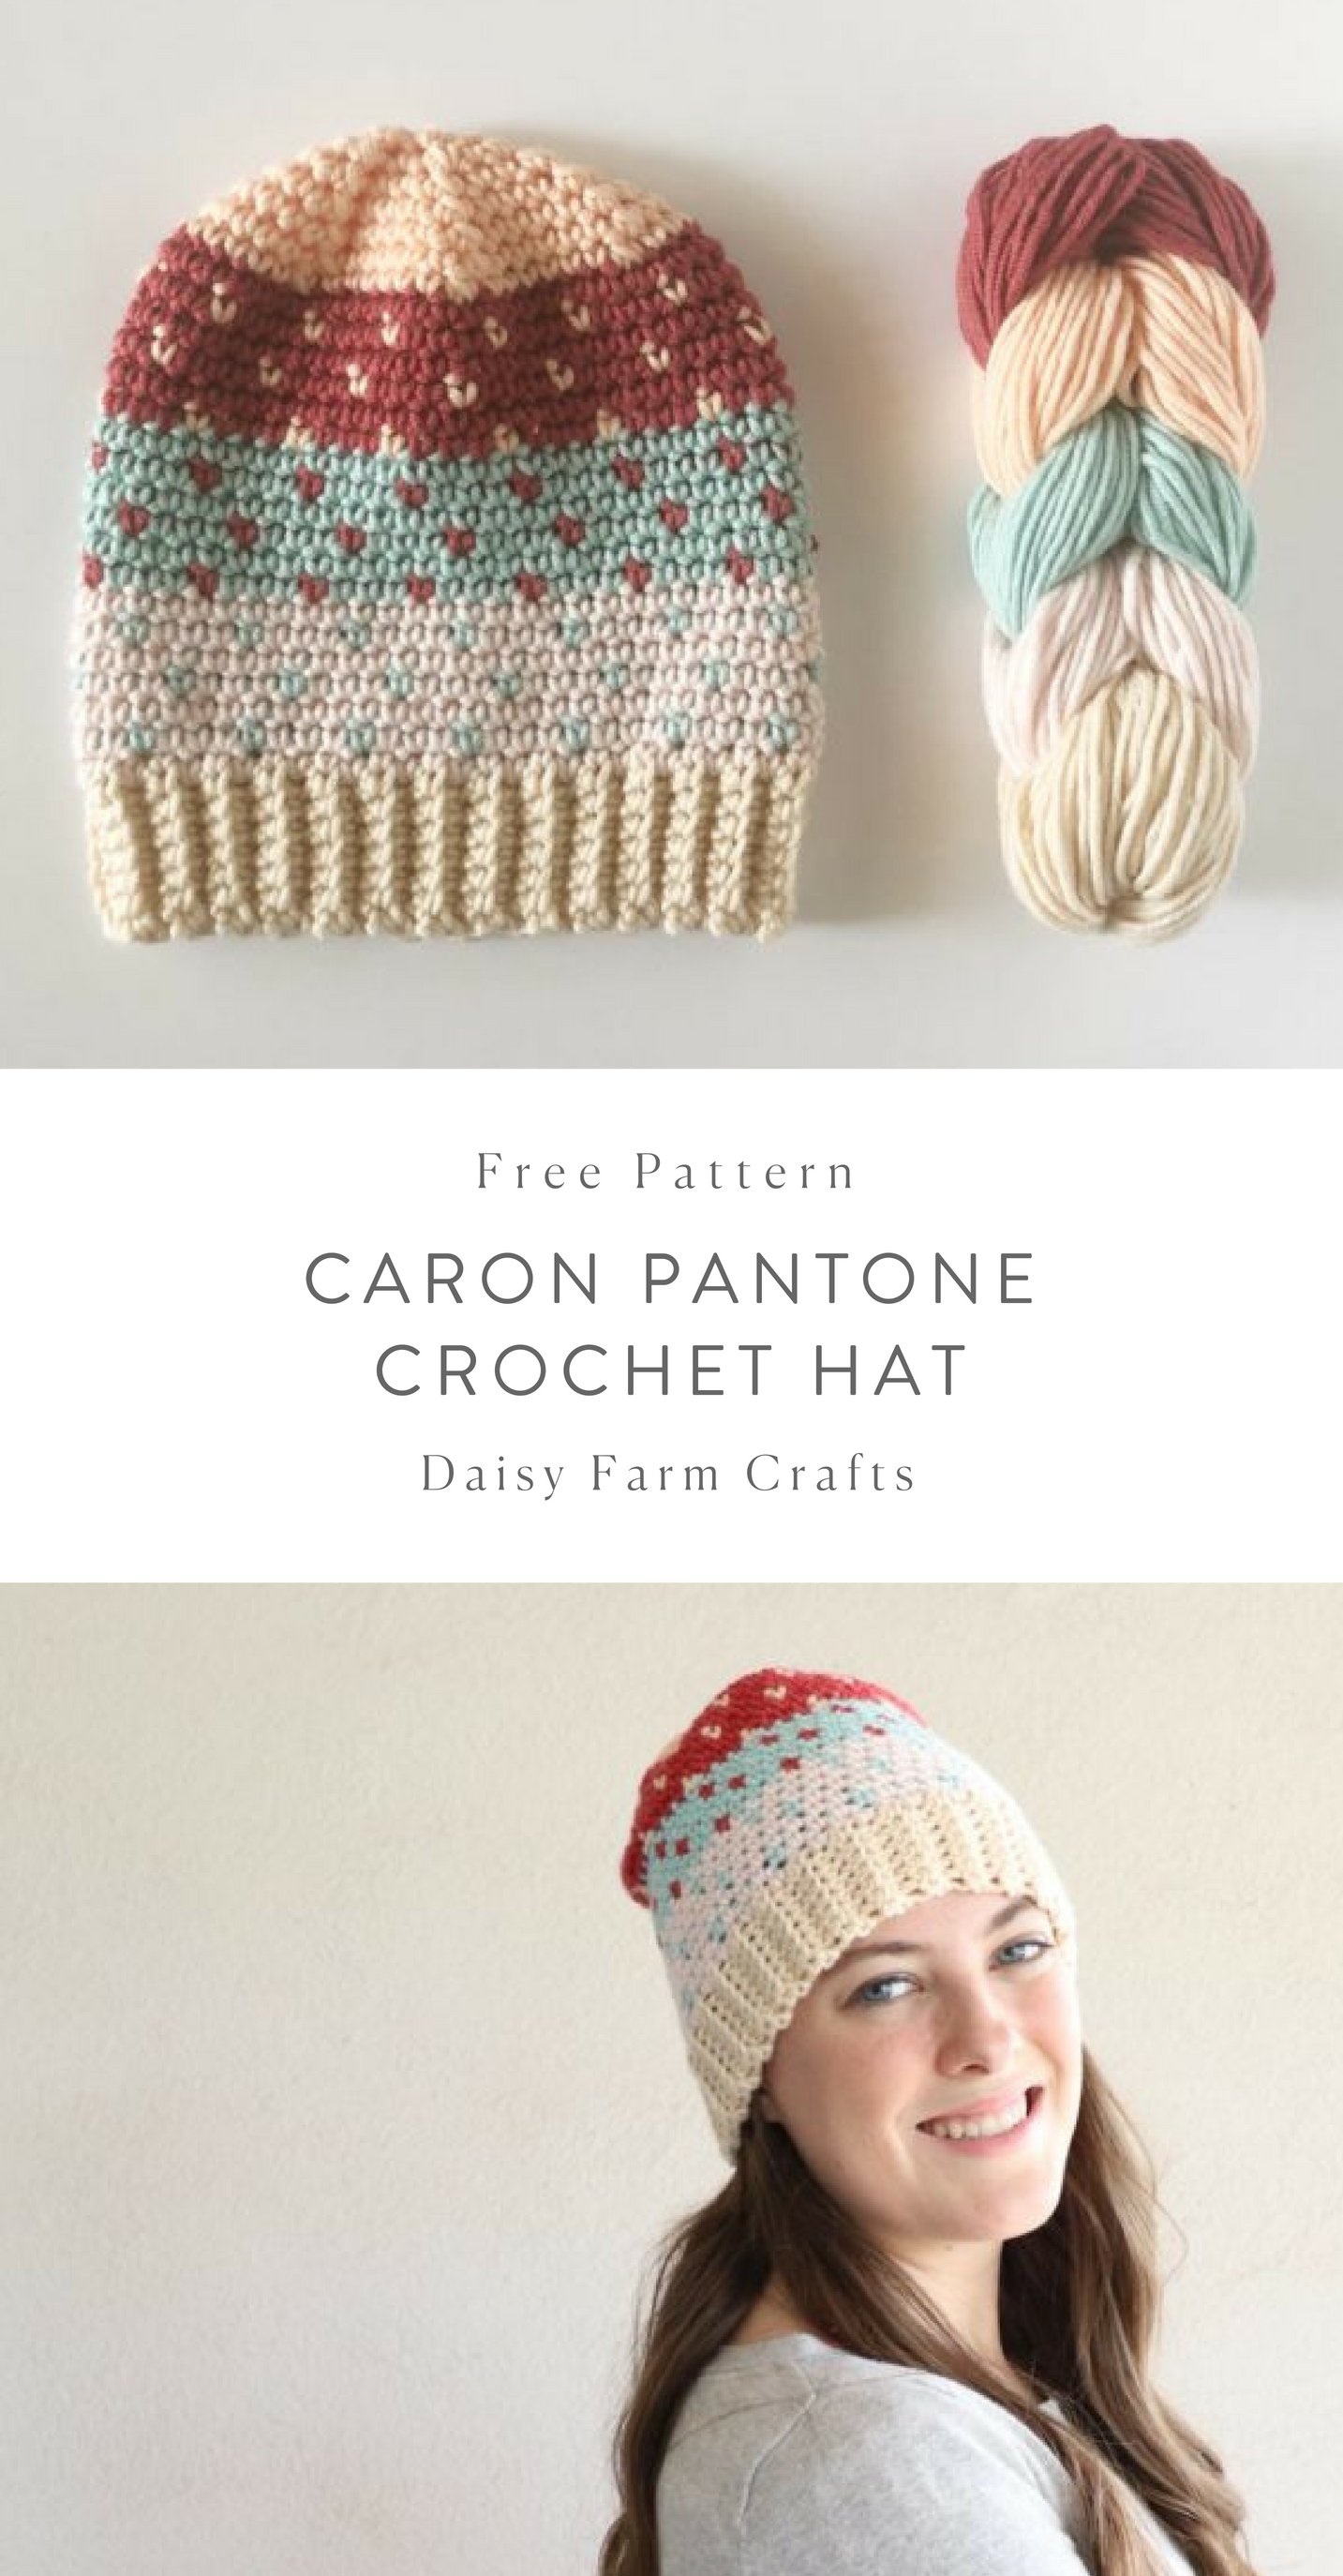 Free Pattern - Caron Pantone Crochet Hat #crochet   Crocheted adult ...